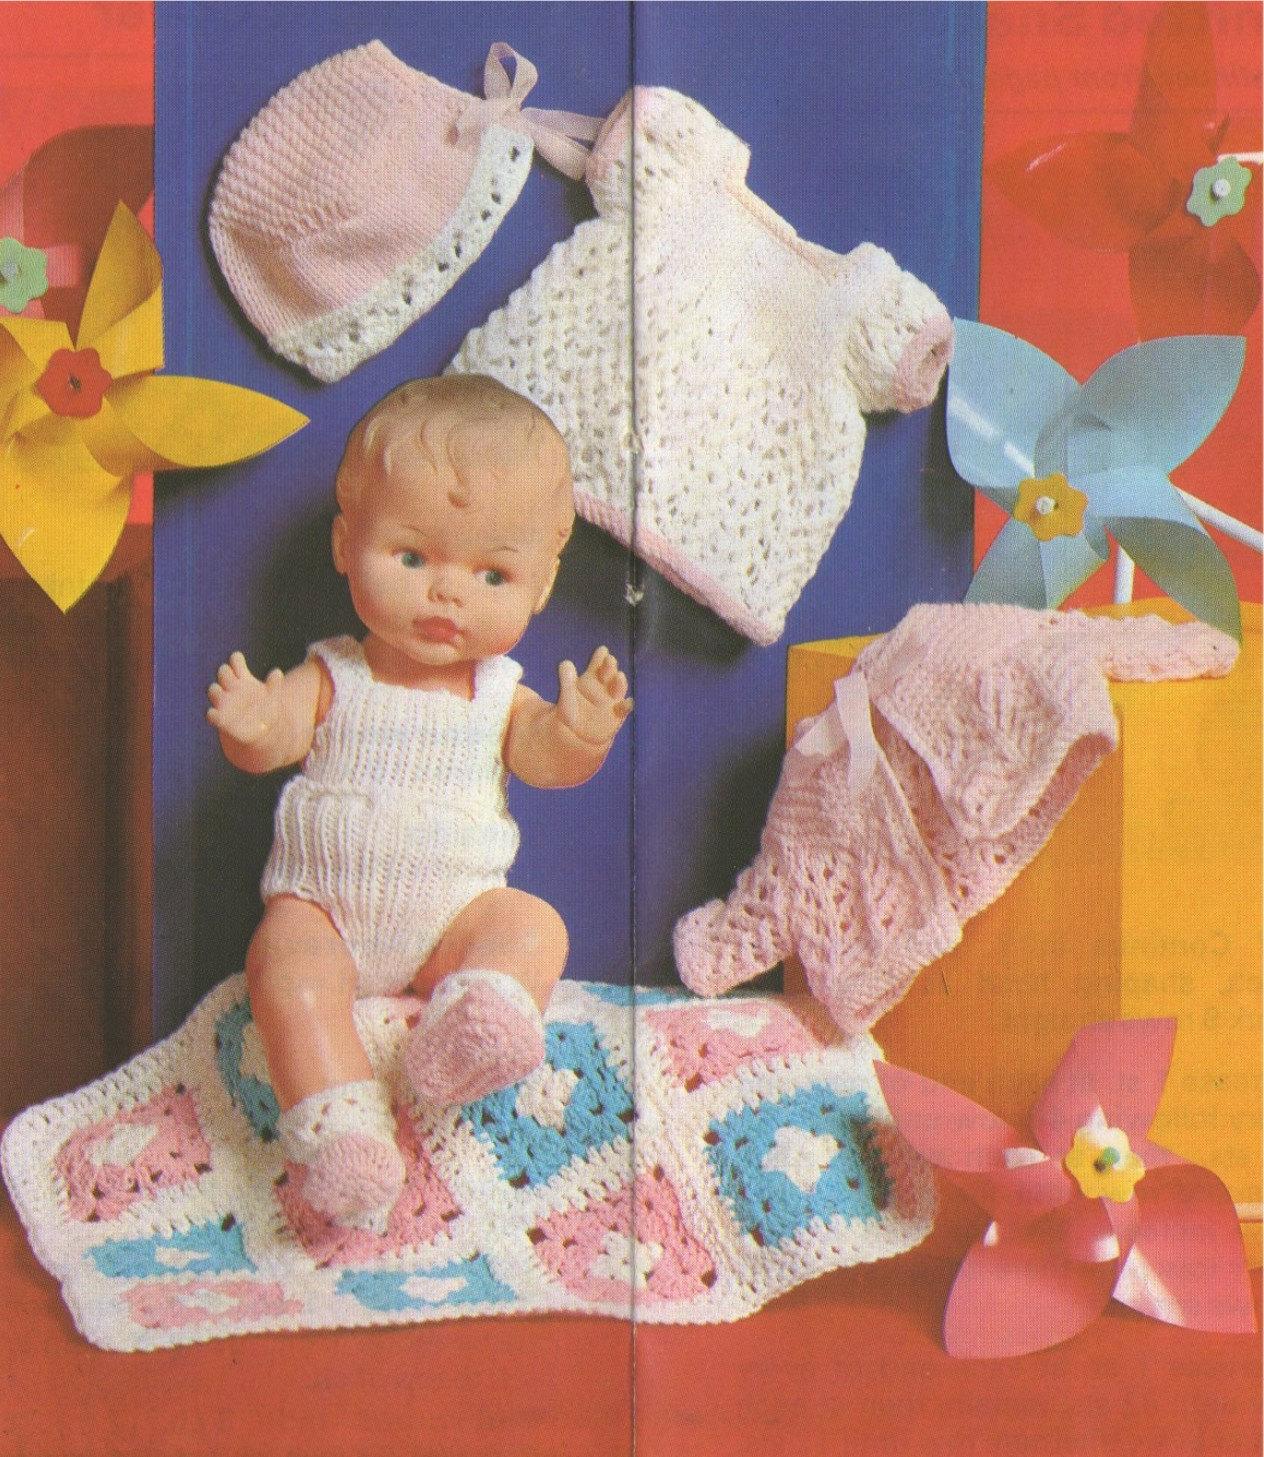 Amigurumi Baby Elephant Pattern : Dolls Clothes PDF Knitting Pattern and Crochet Blanket Pattern